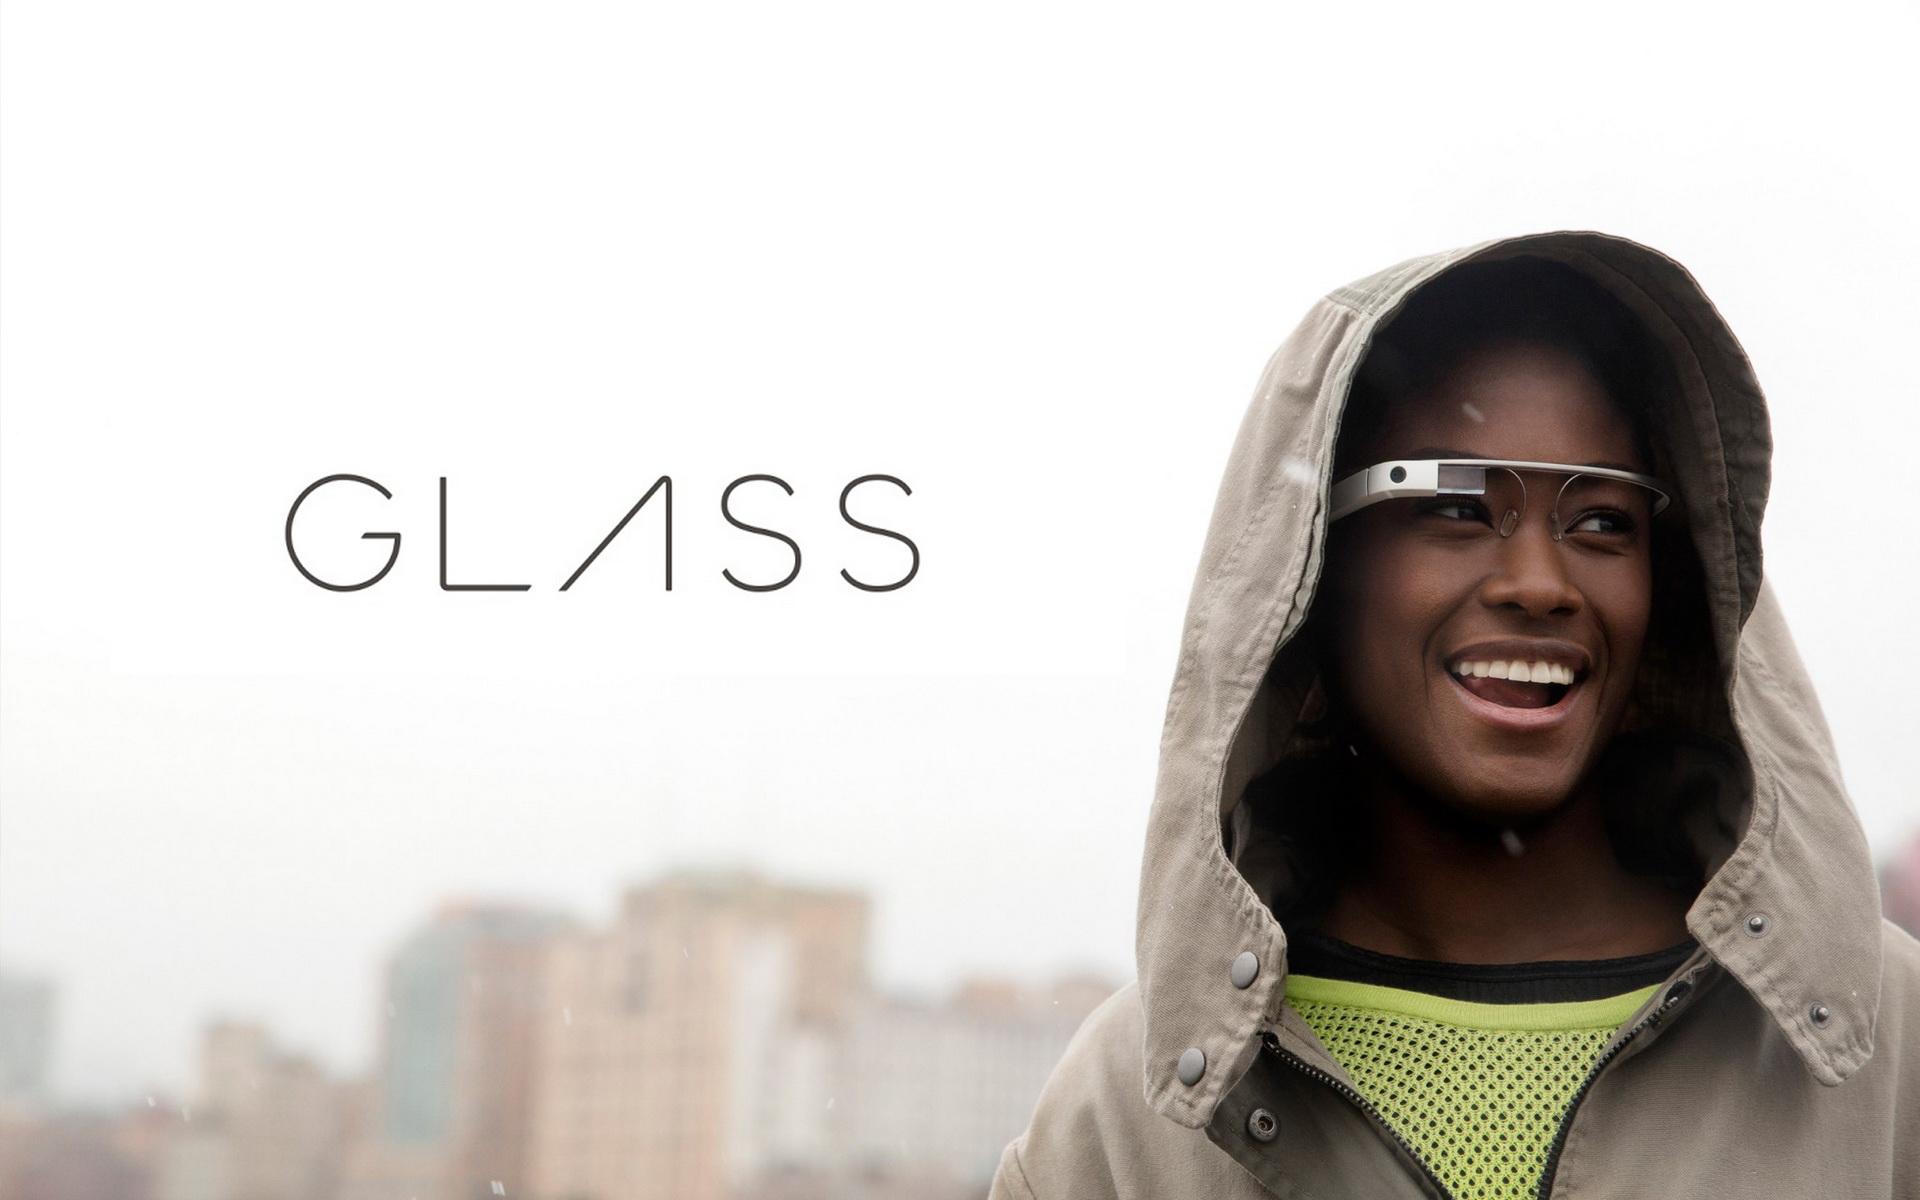 Google Glass Jailbroken